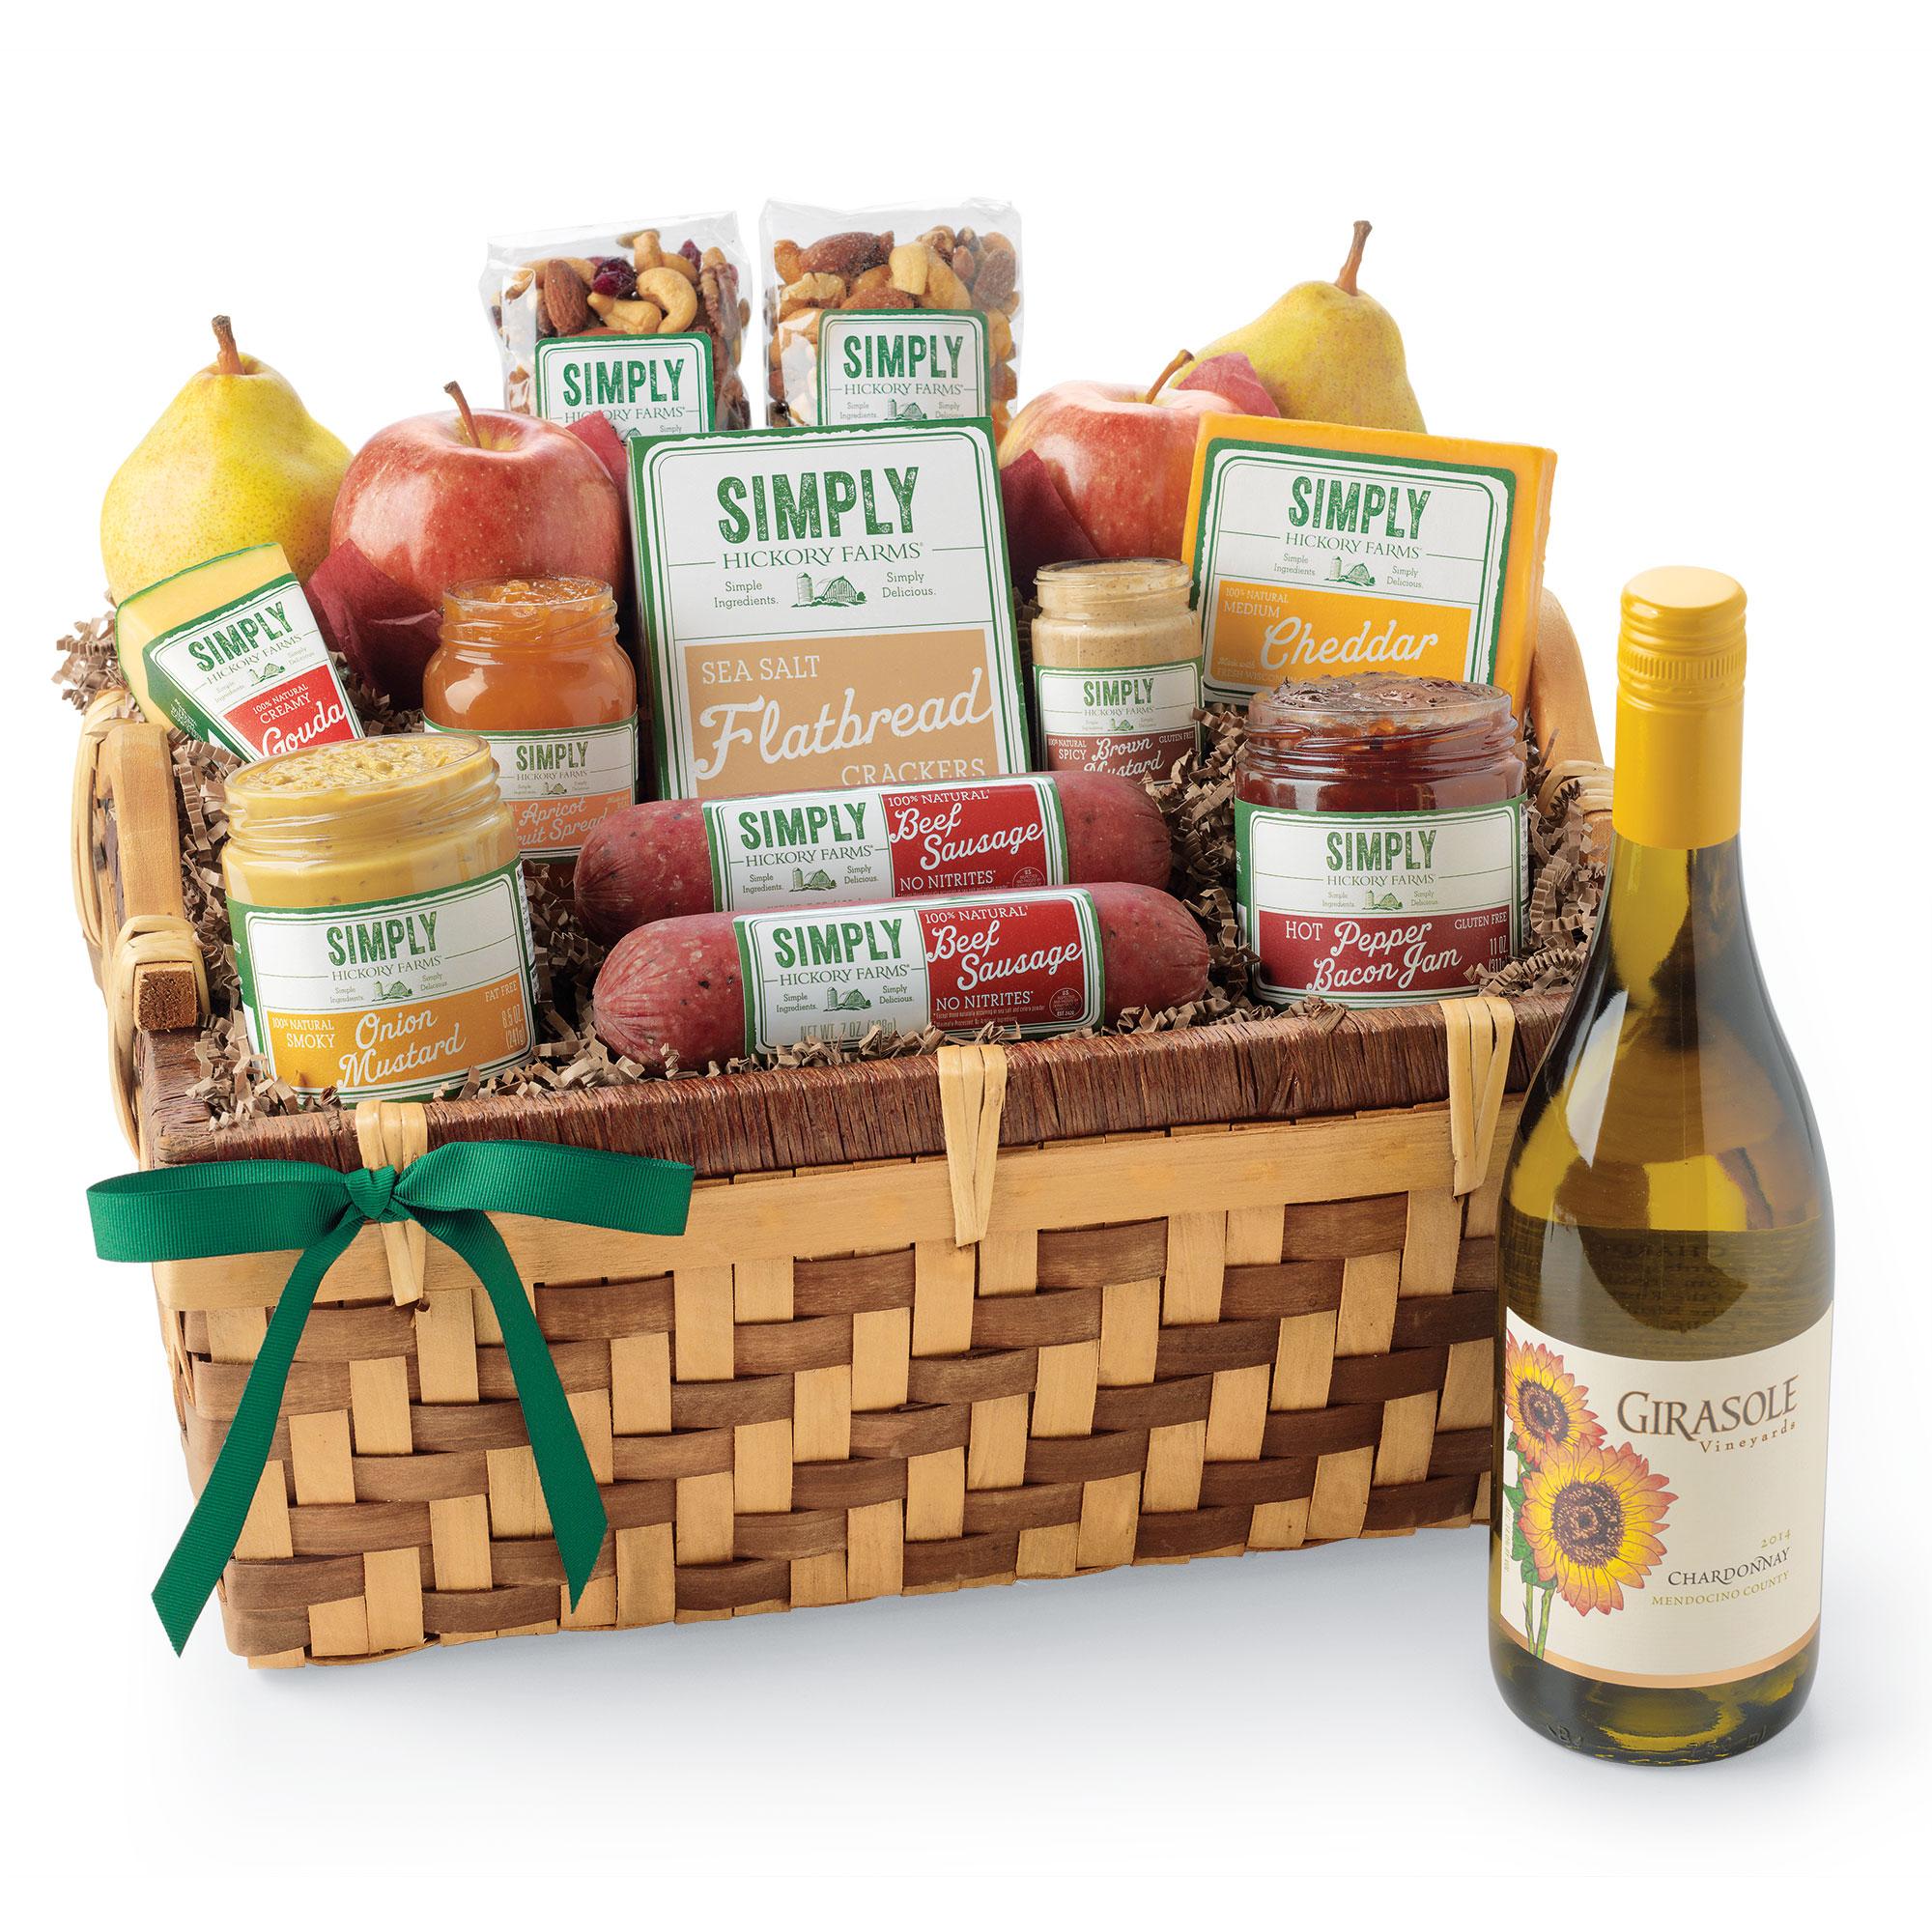 Pepperidge Farm Gift Baskets Canada Lamoureph Blog